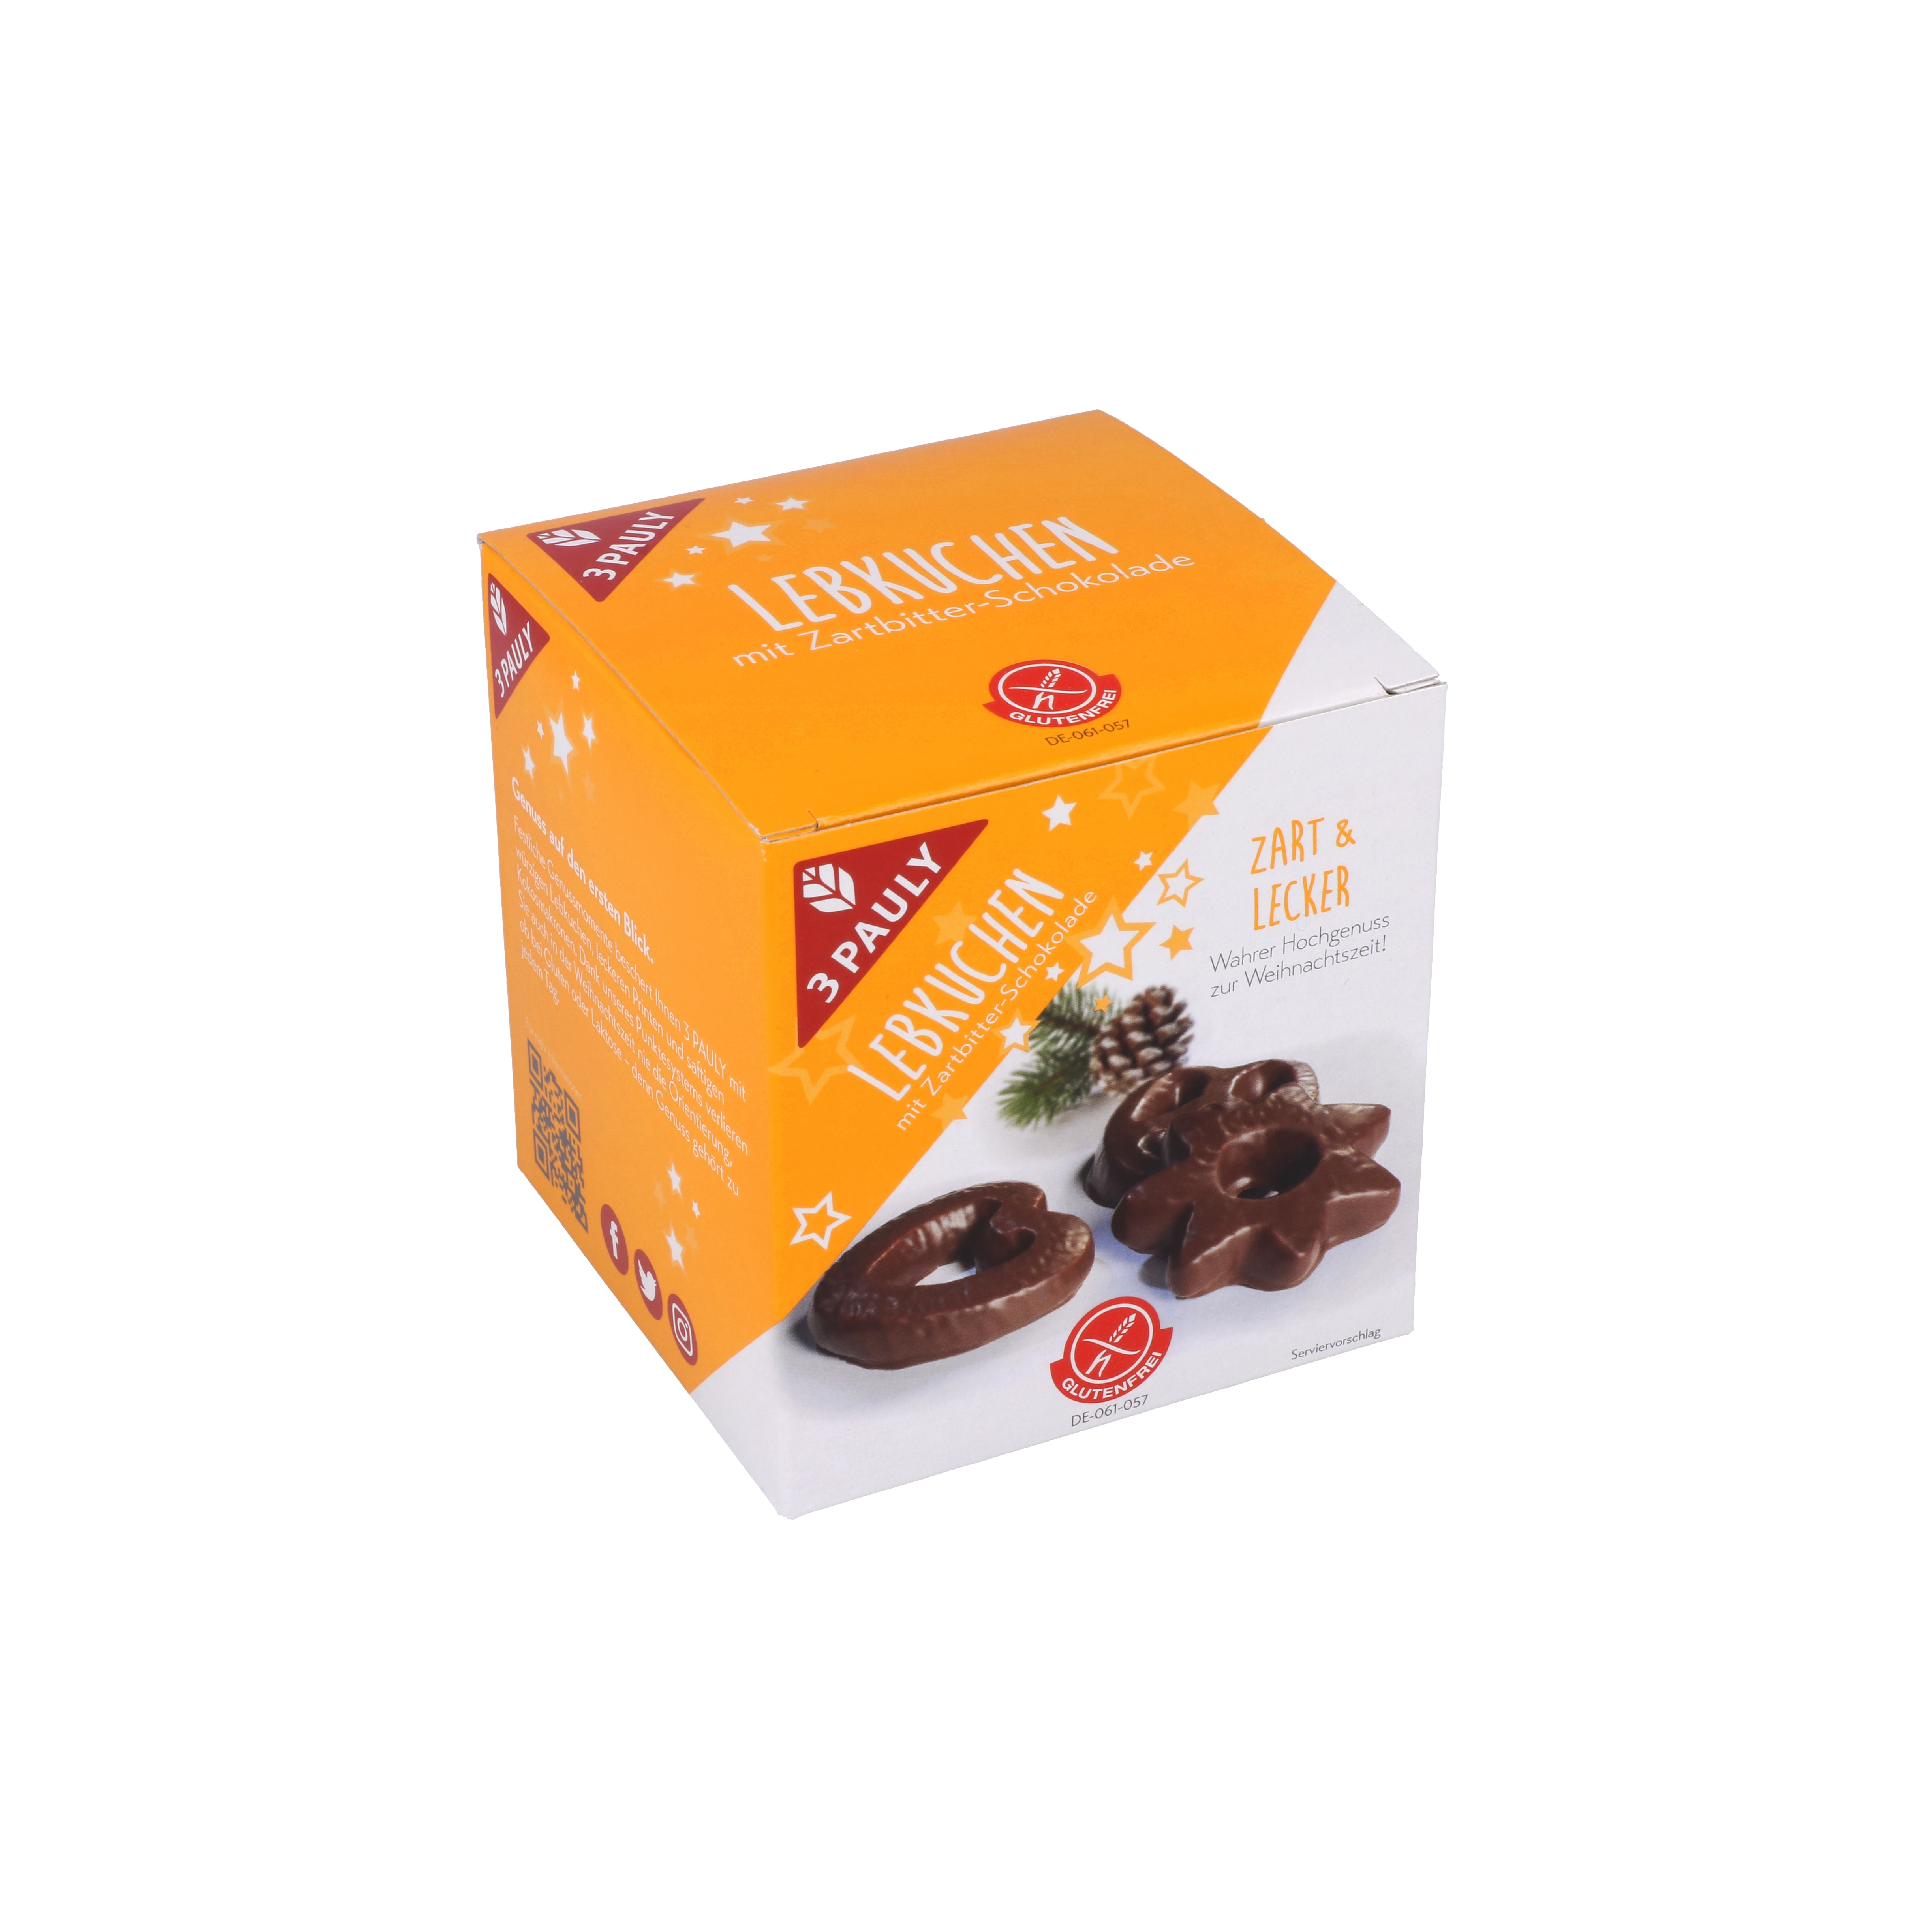 3 Pauly Lebkuchen mit Zartbitter-Schokolade 165g